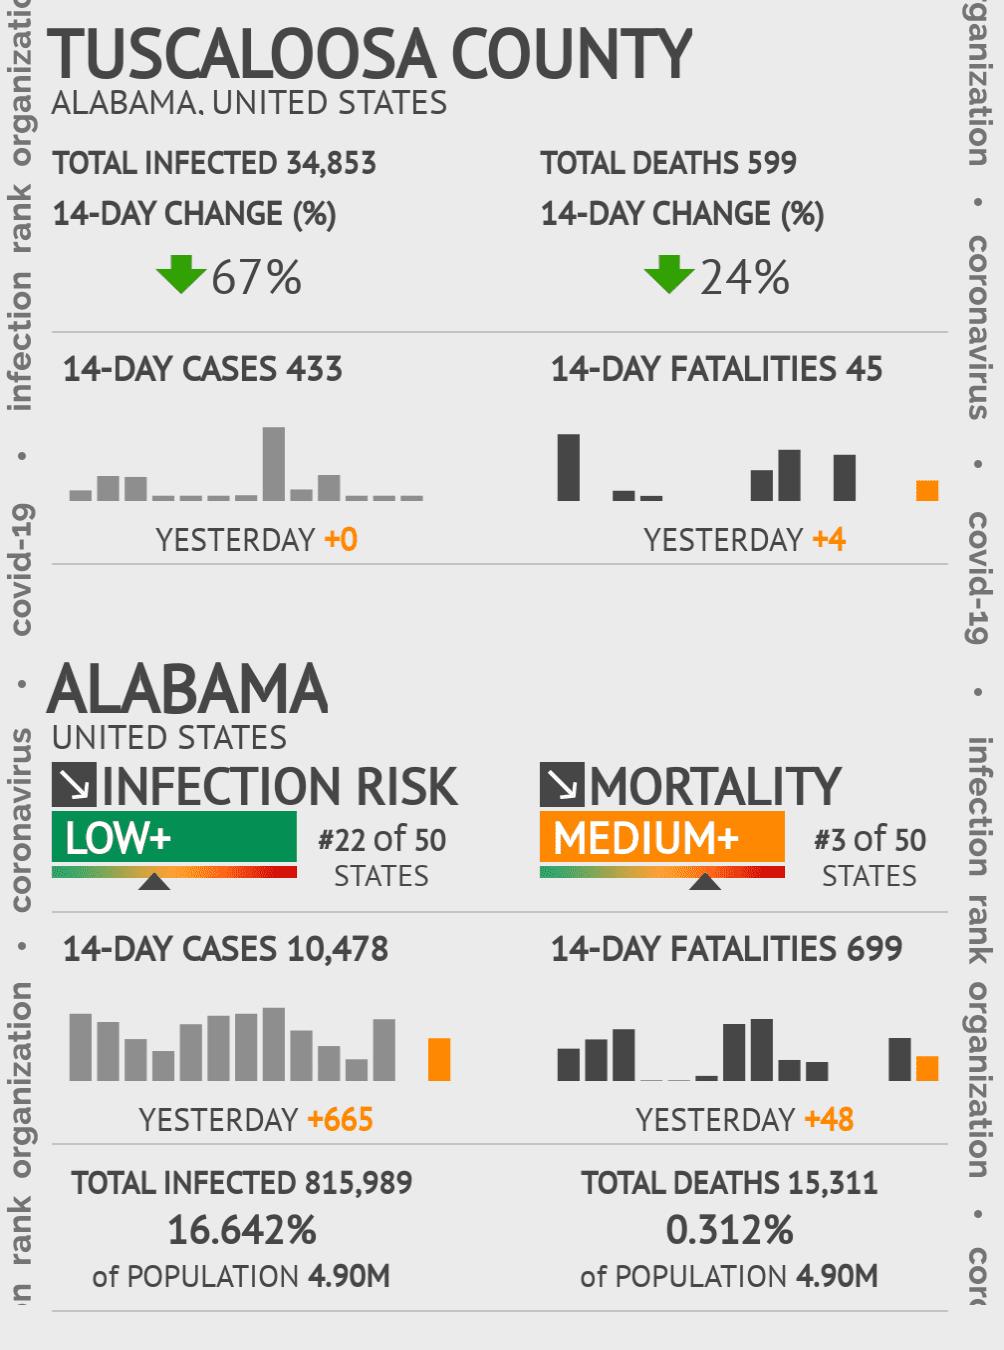 Tuscaloosa County Coronavirus Covid-19 Risk of Infection on February 25, 2021